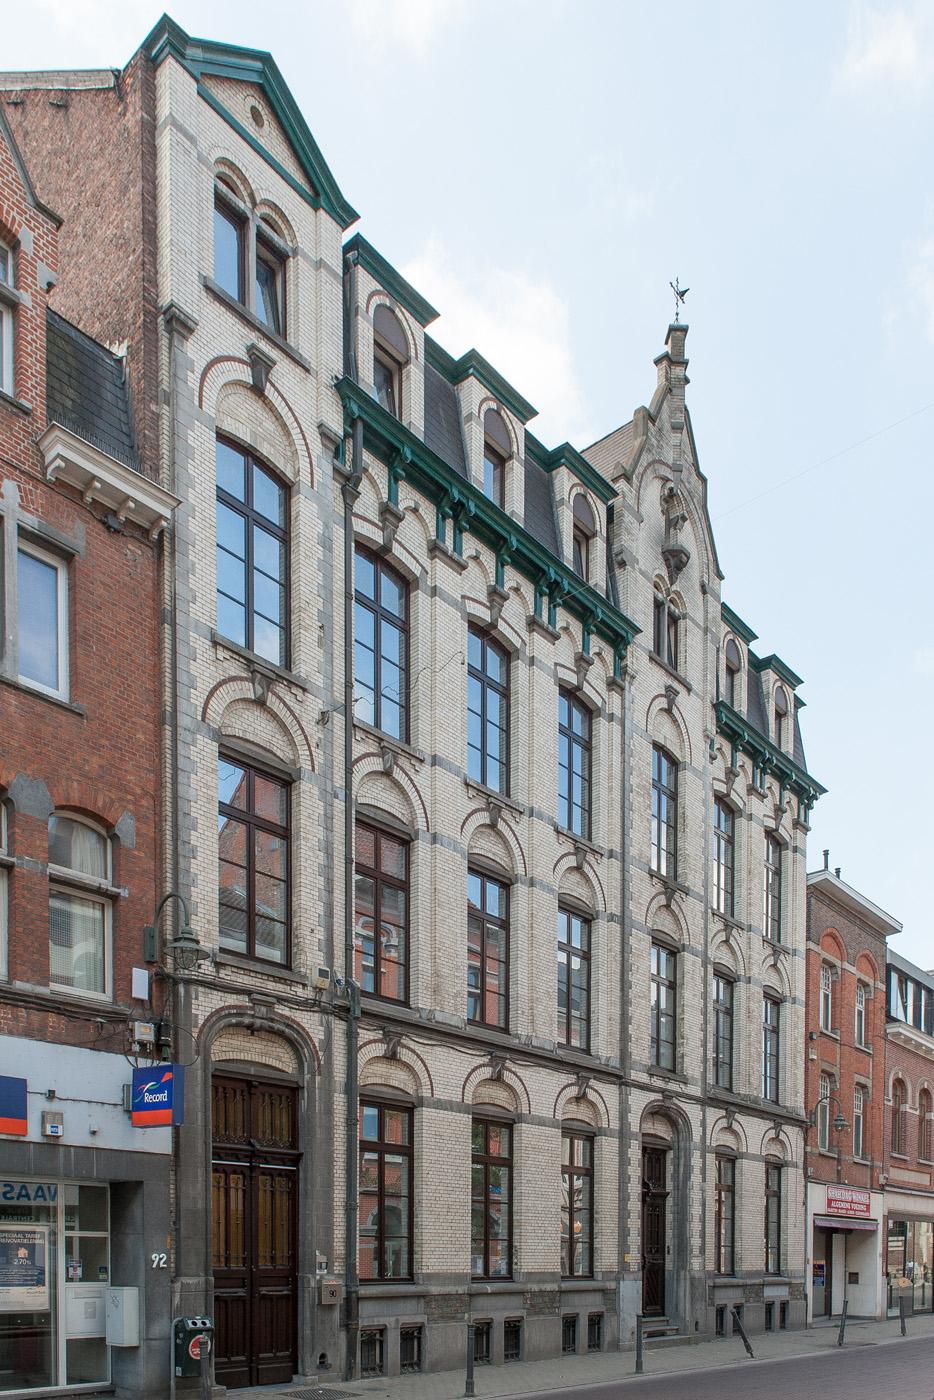 Woonzorgcentrum Mariatroon Dendermonde historie